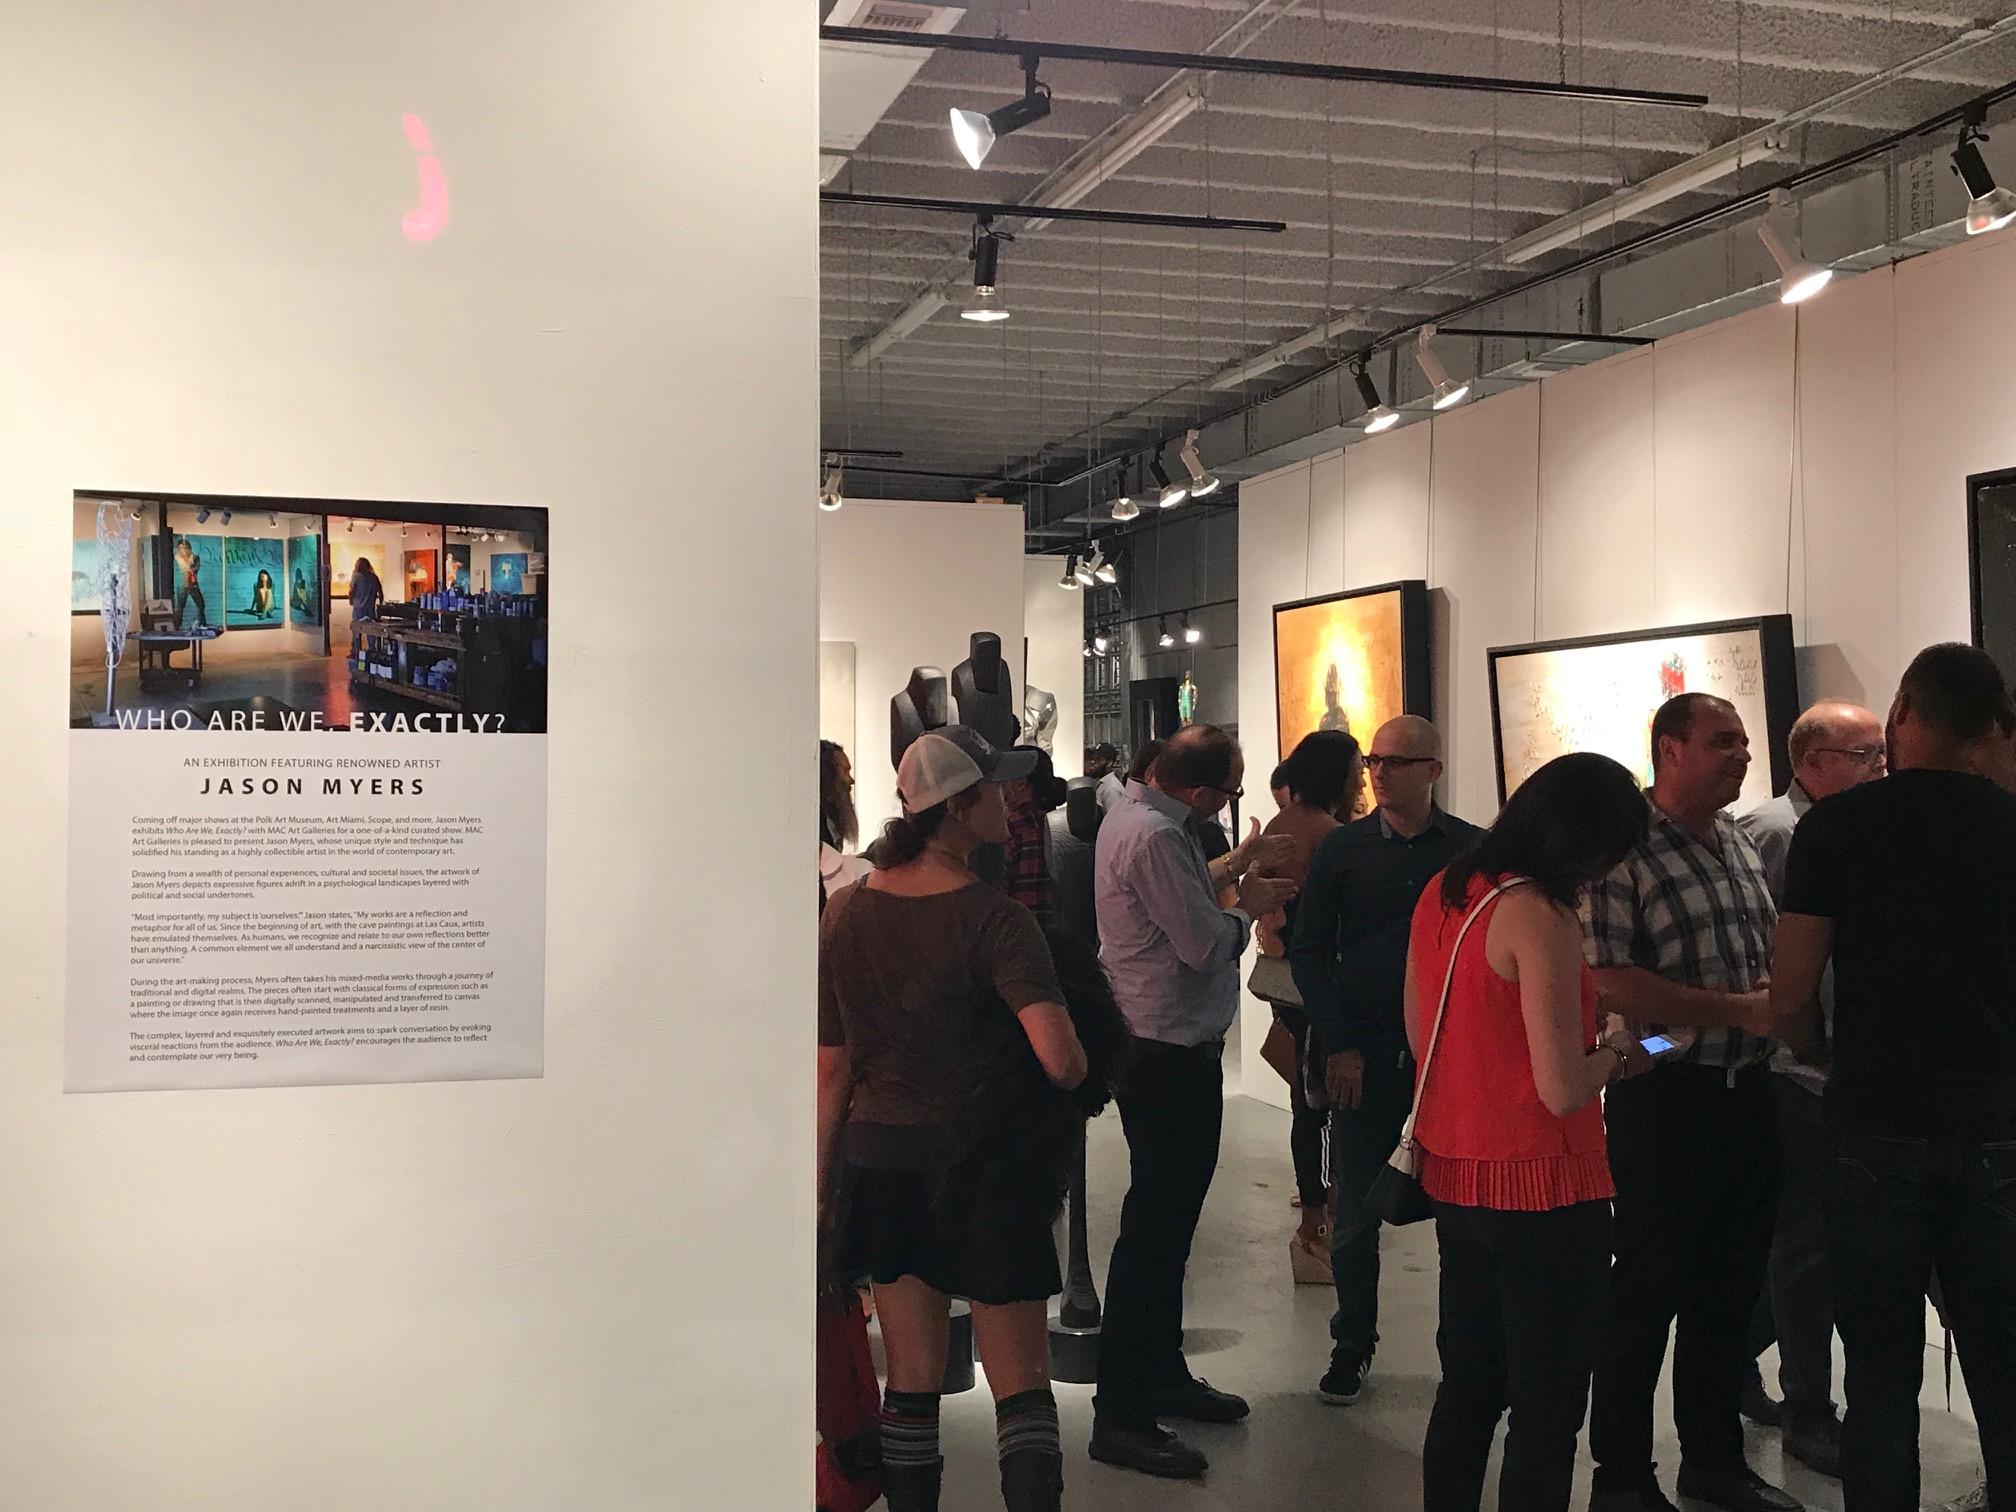 Jason Myers - Who Are We, Exactly? | MAC FINE ART